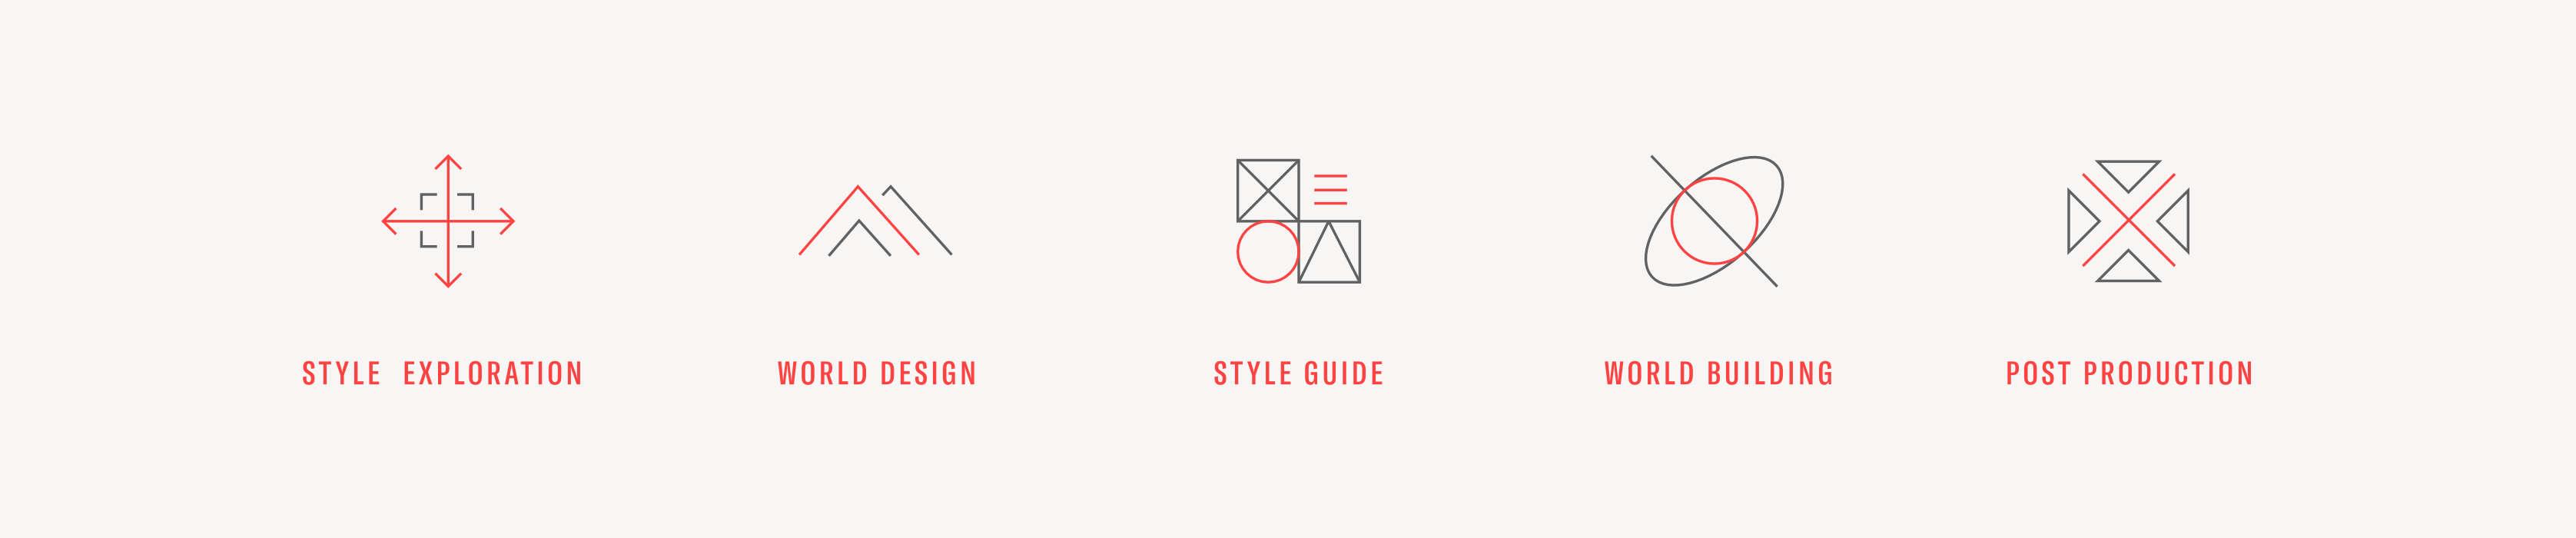 Icon designs that outline West Studio's creative process.